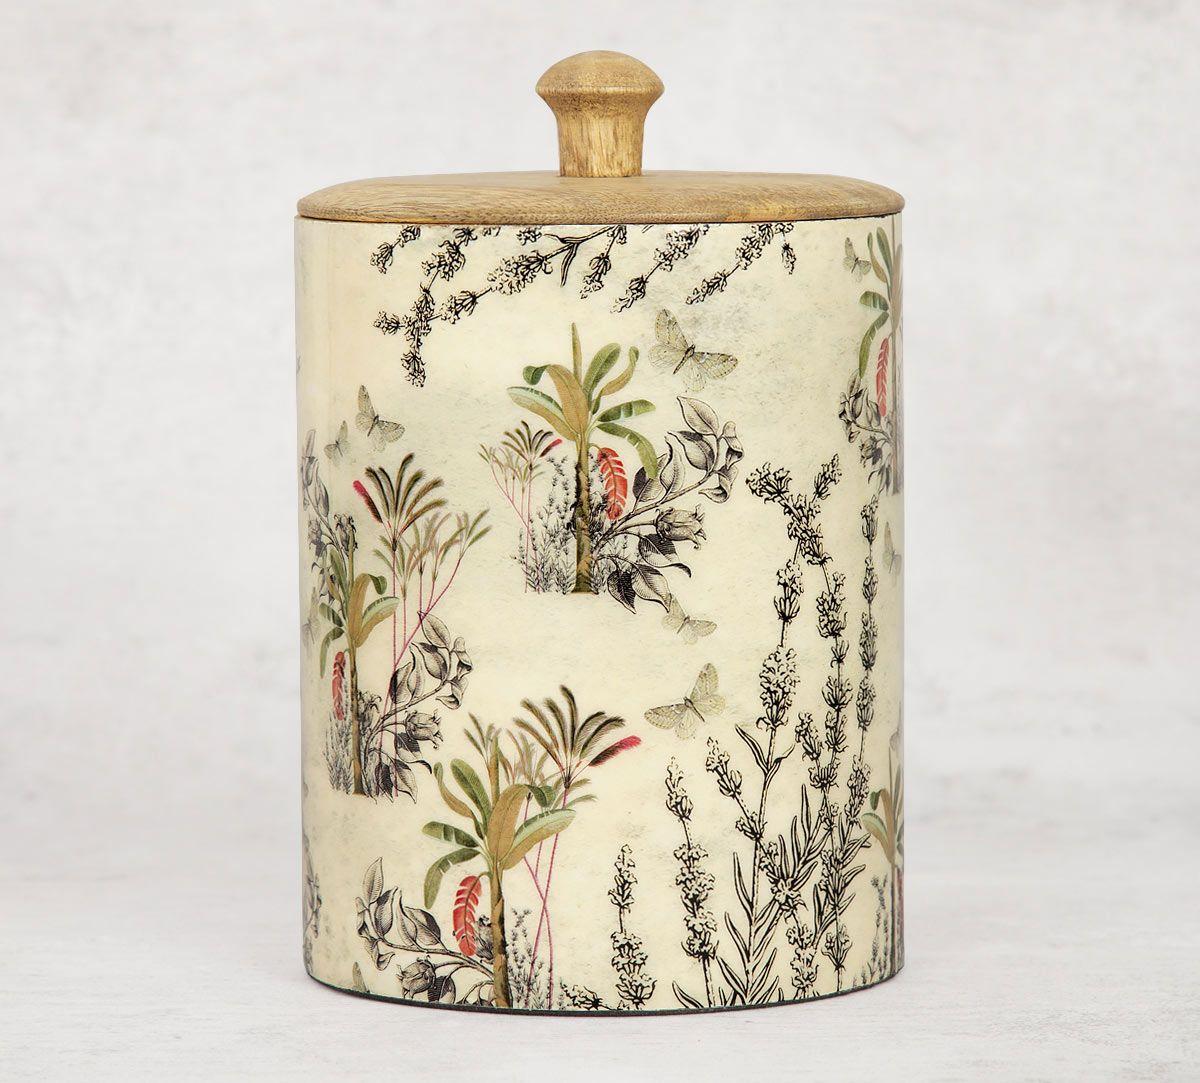 India Circus Desert Plants Medium Wooden Jar